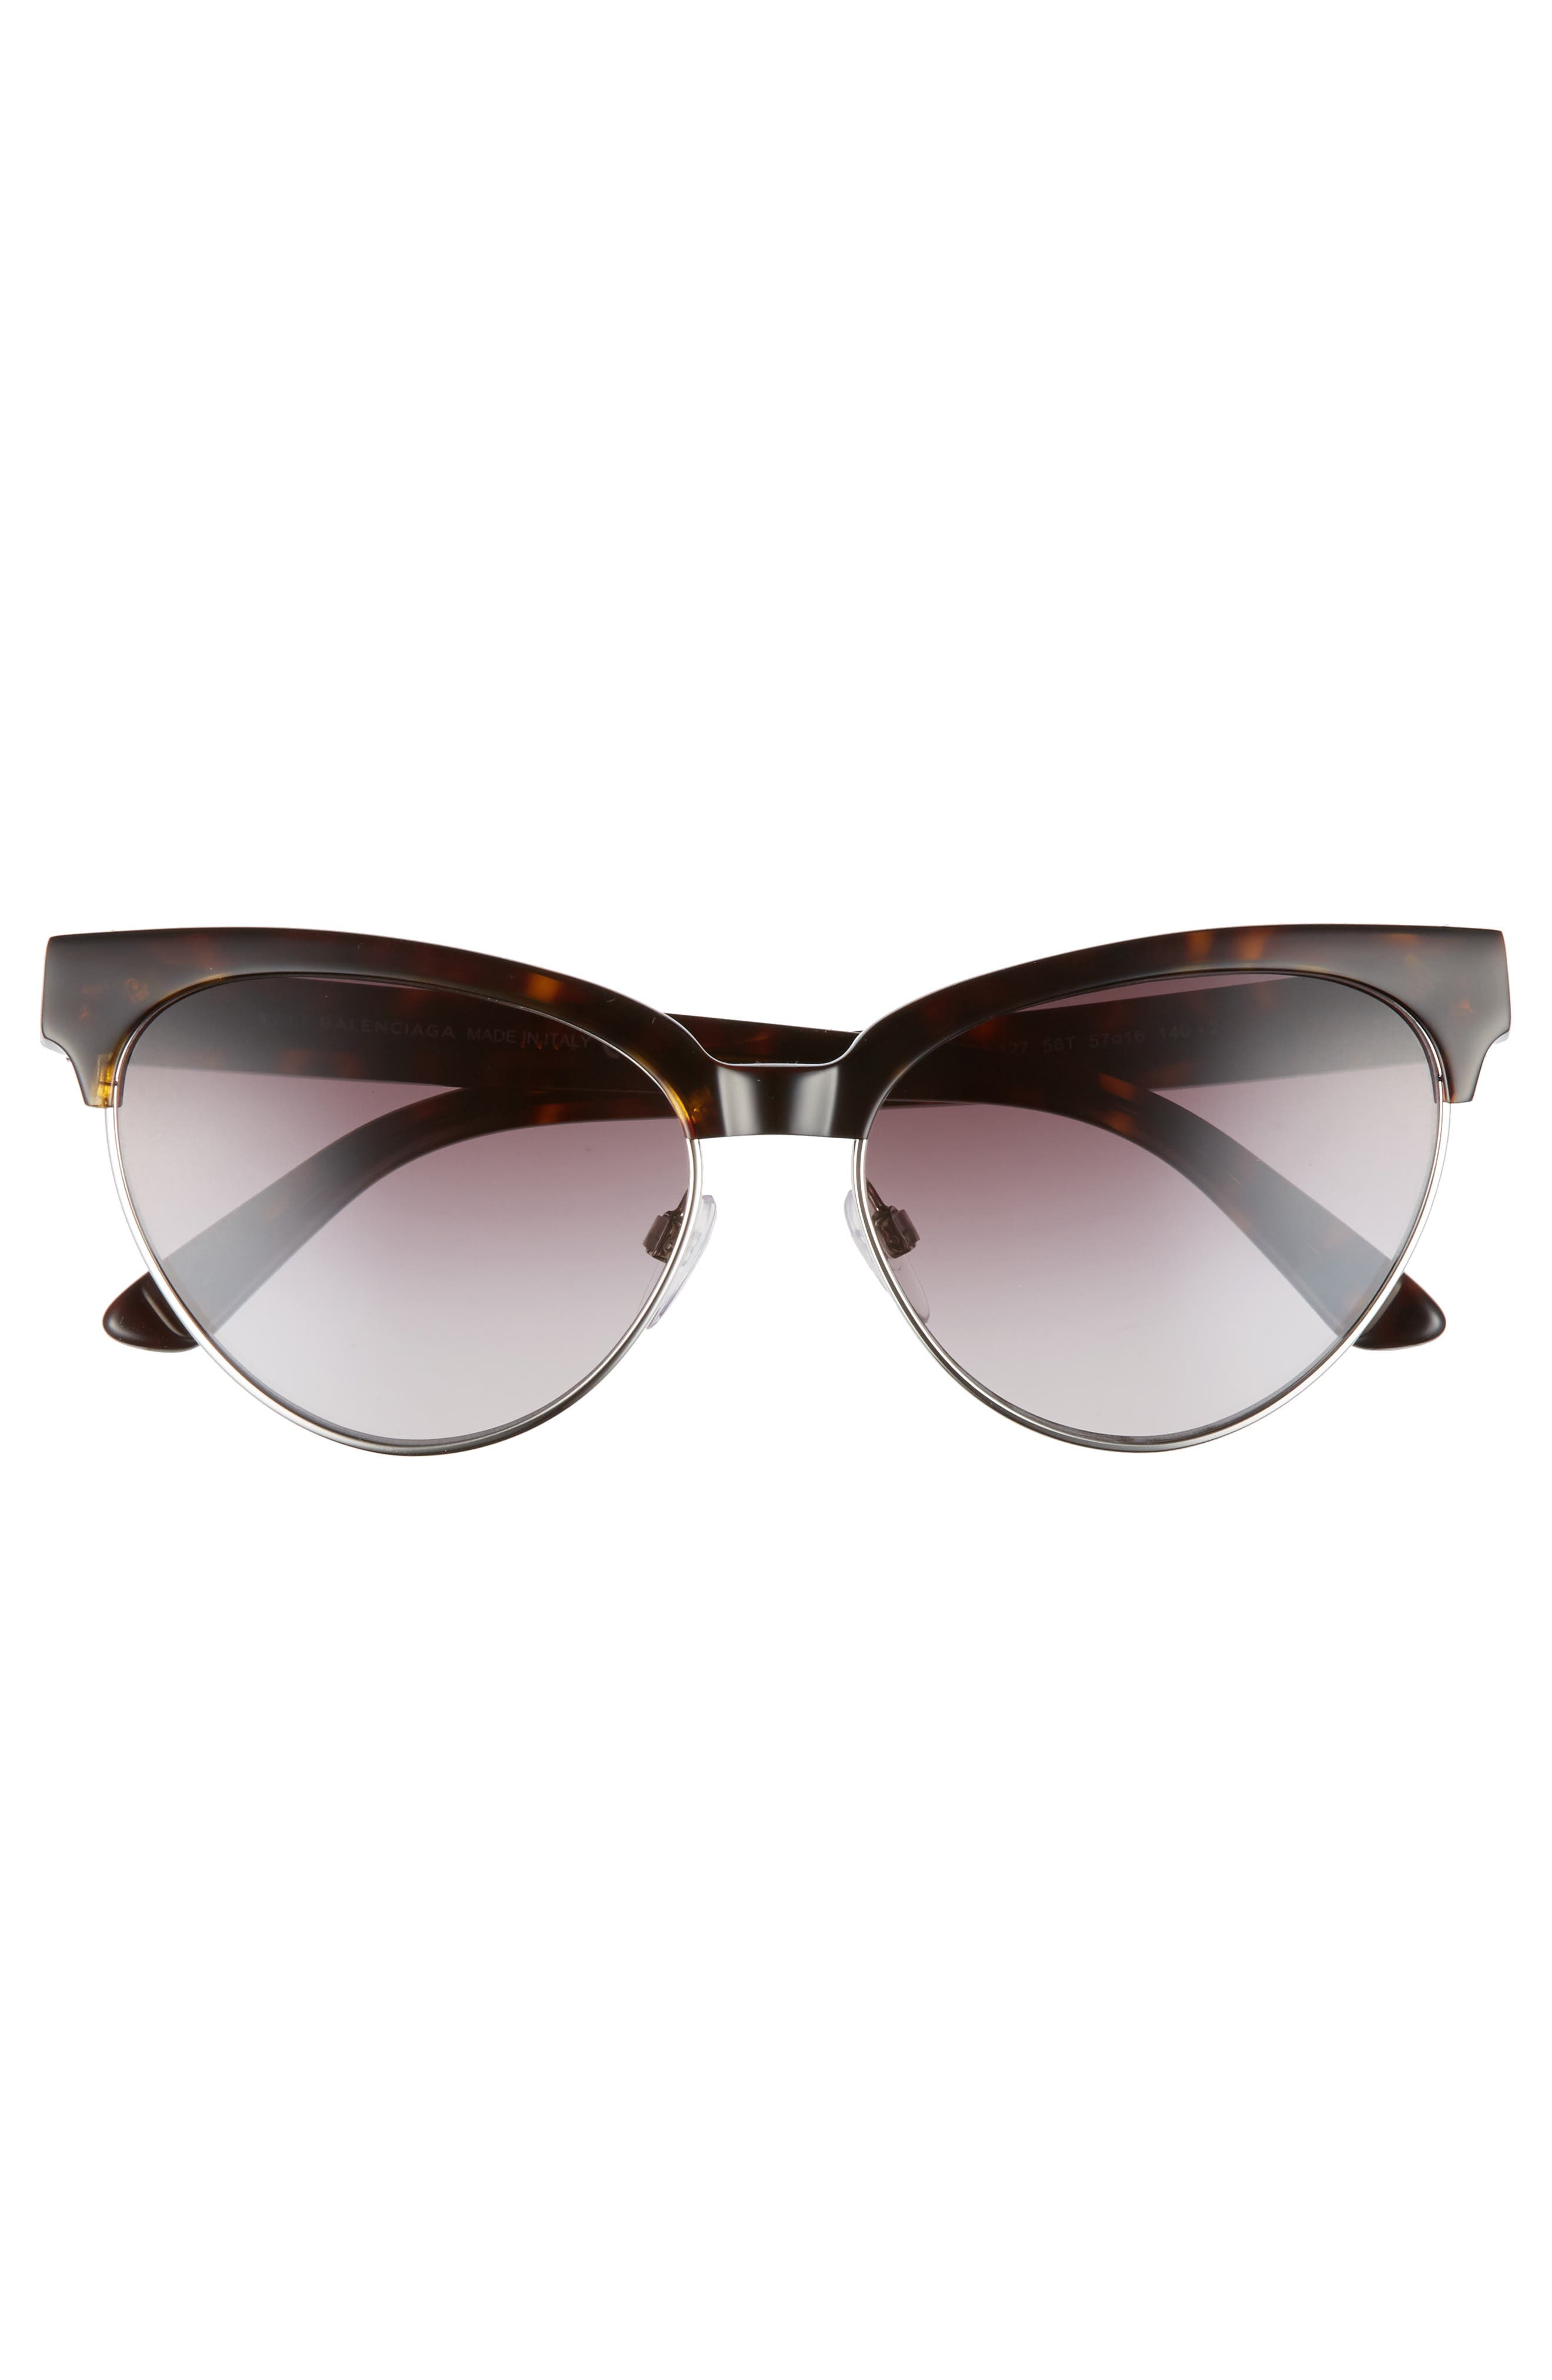 Alternate Image 3  - Balenciaga 57mm Gradient Cat Eye Sunglasses